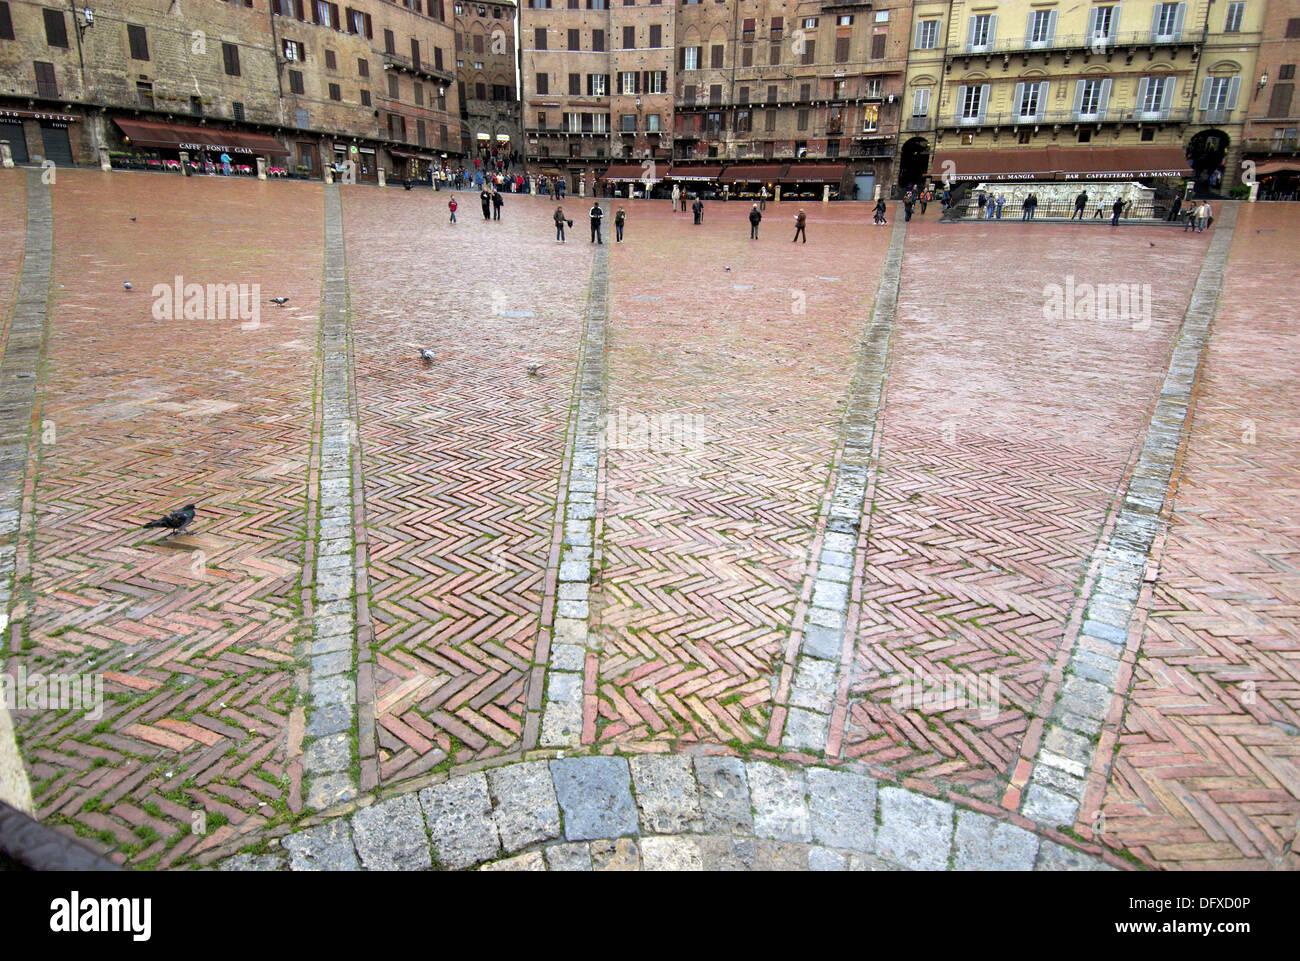 Siena, Piazza del Campo, pavement, rain, wetness, Tuscany, Italy - Stock Image